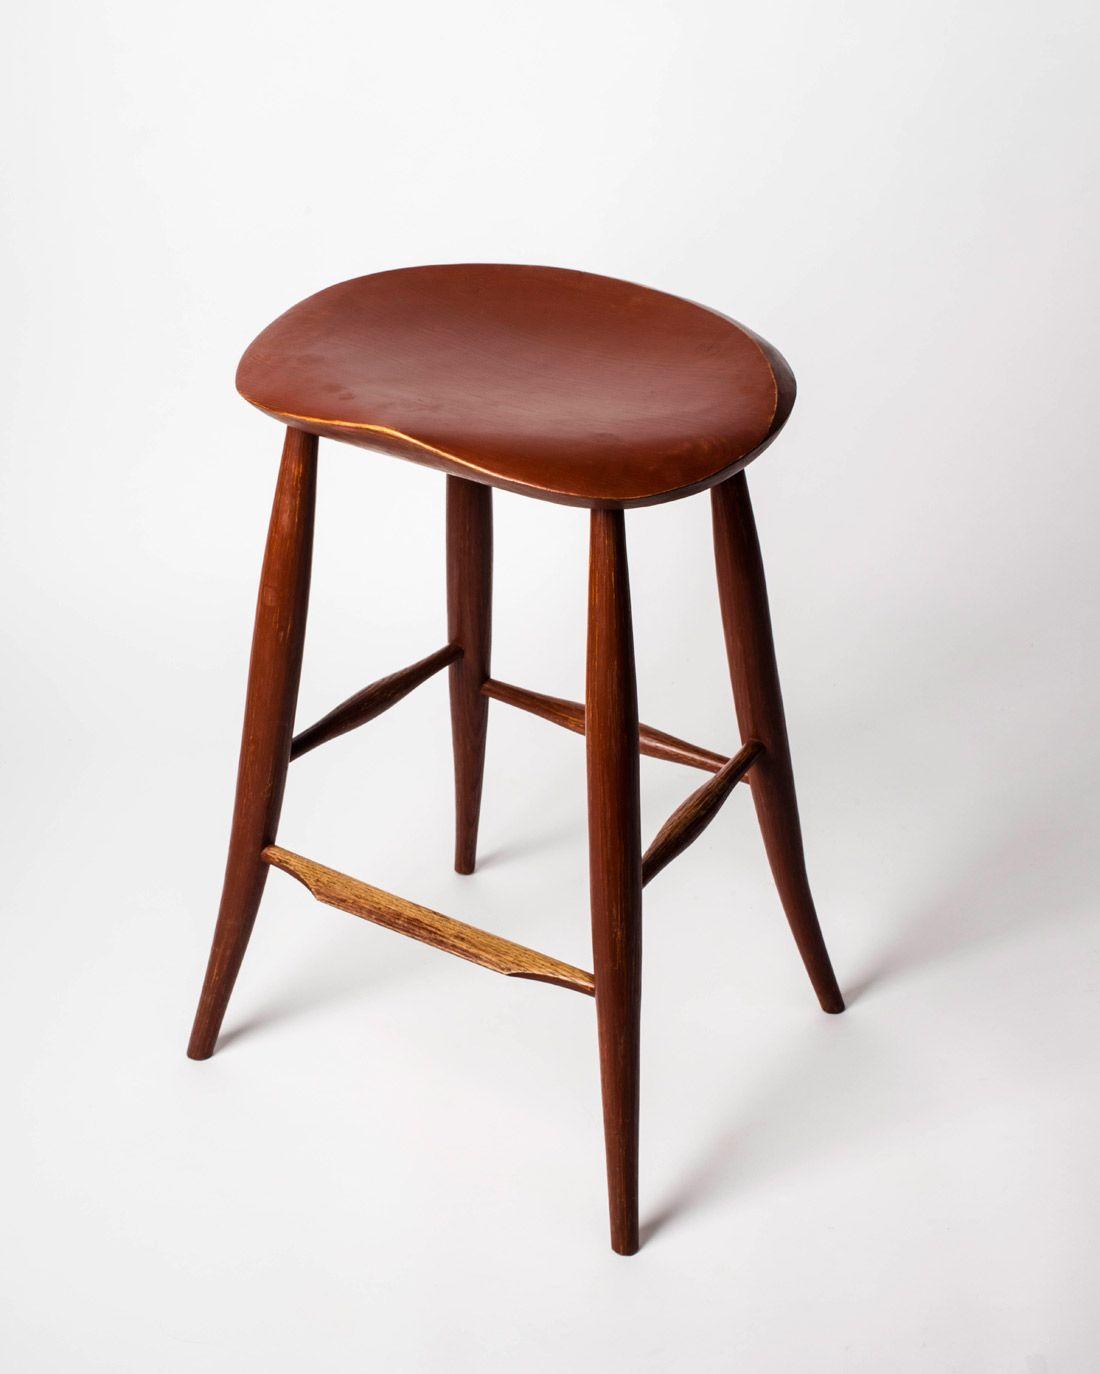 Fabulous Windsor Stools Tables Elia Bizzarri Hand Tool Ibusinesslaw Wood Chair Design Ideas Ibusinesslaworg